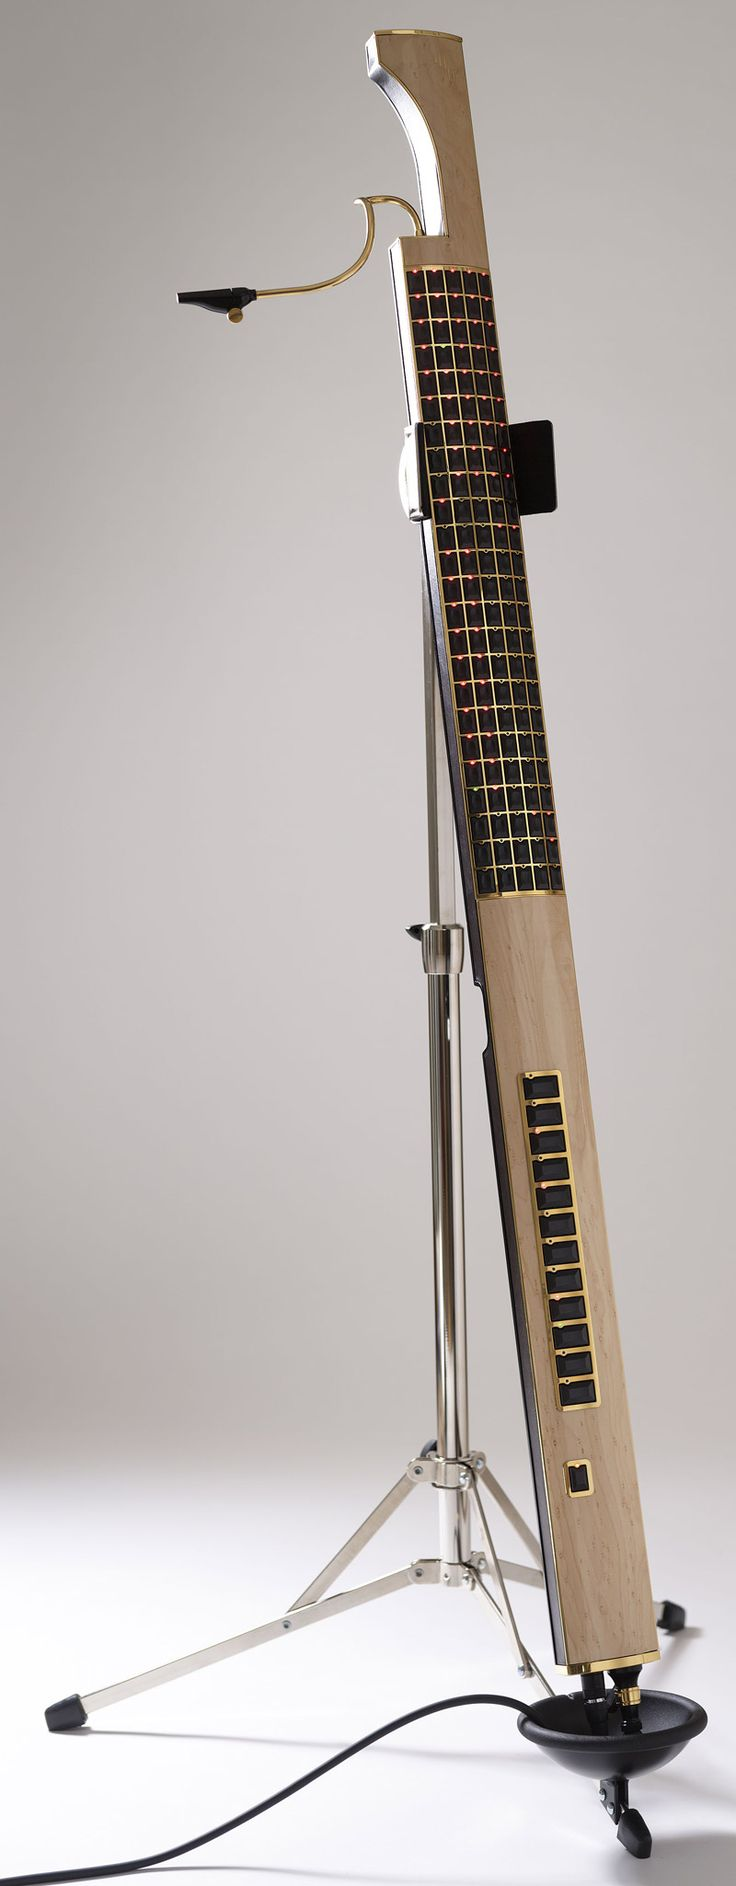 The Eigenharp. A sleek and beautiful musical instrument with astonishing performance capabilities. | WeImprovise.net